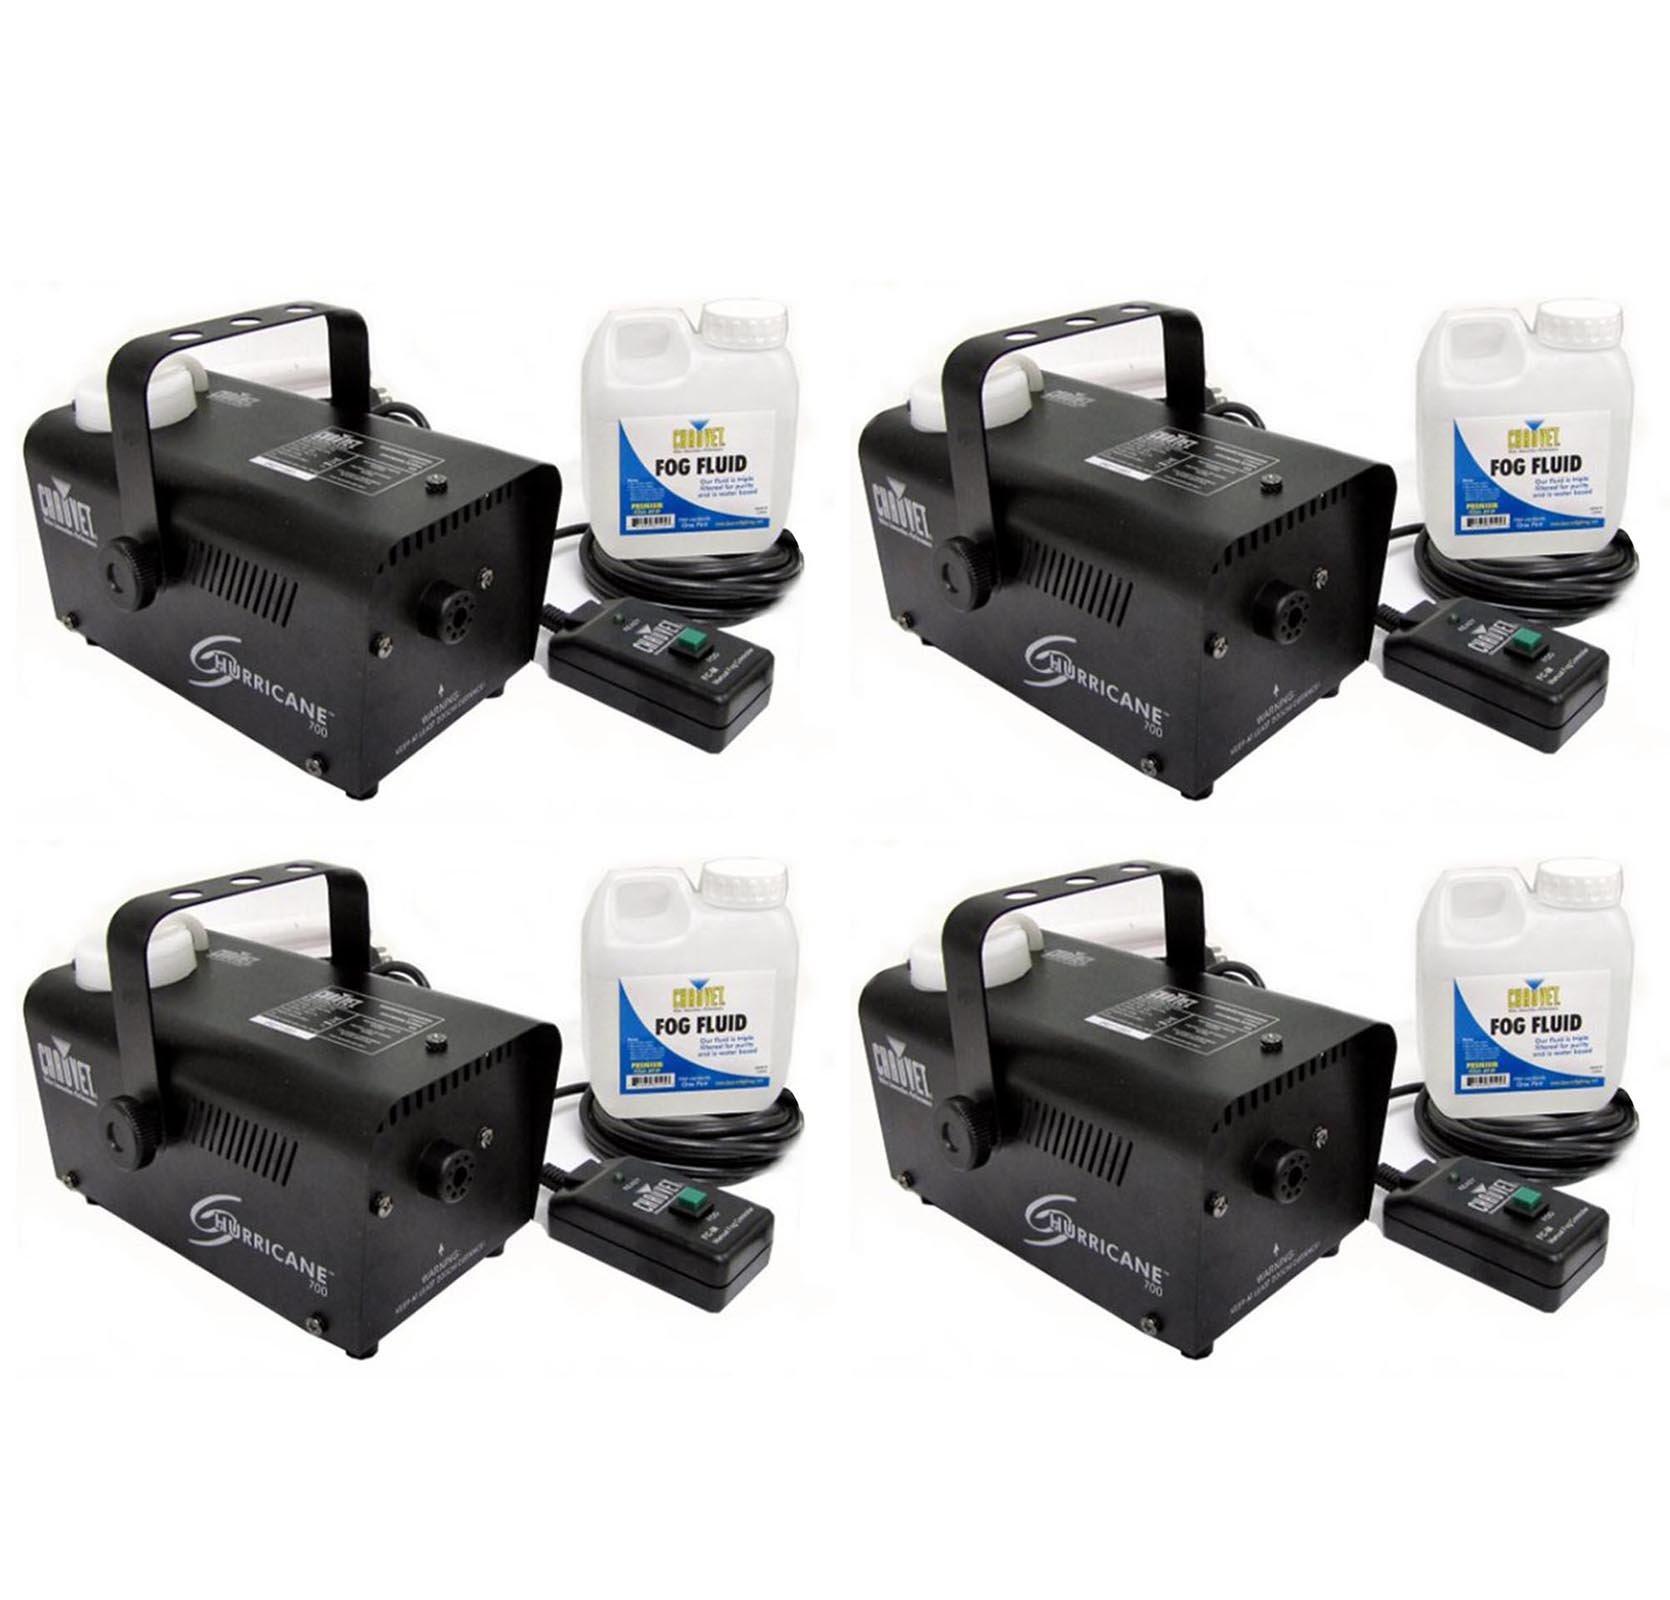 (4) Chauvet Halloween DJ Fog Smoke Machines w/ Fog Fluid & Wired Remote | H-700